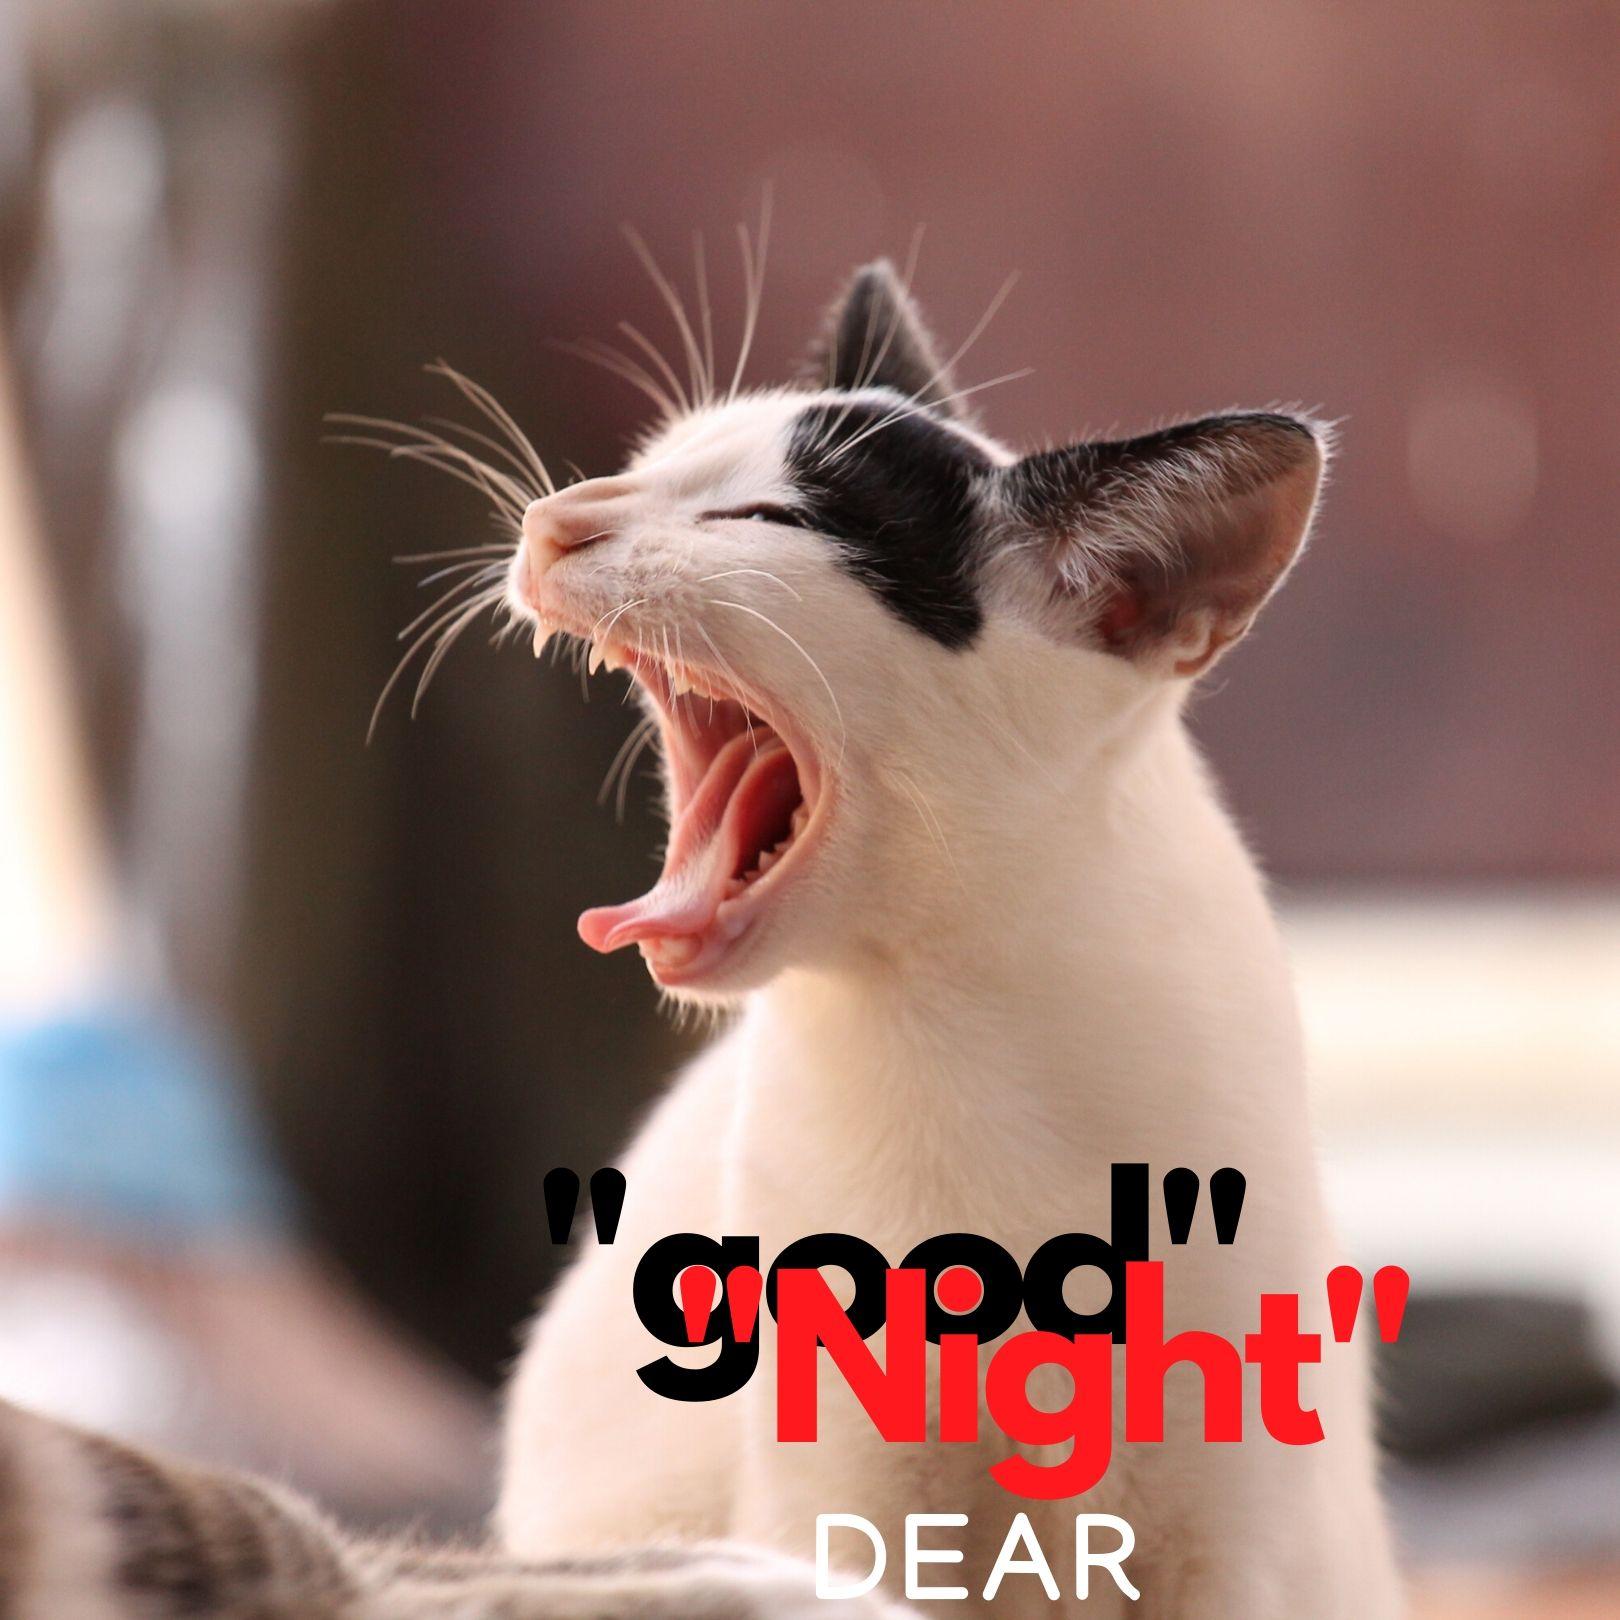 Good Night Dear Sleepy cat image full HD free download.